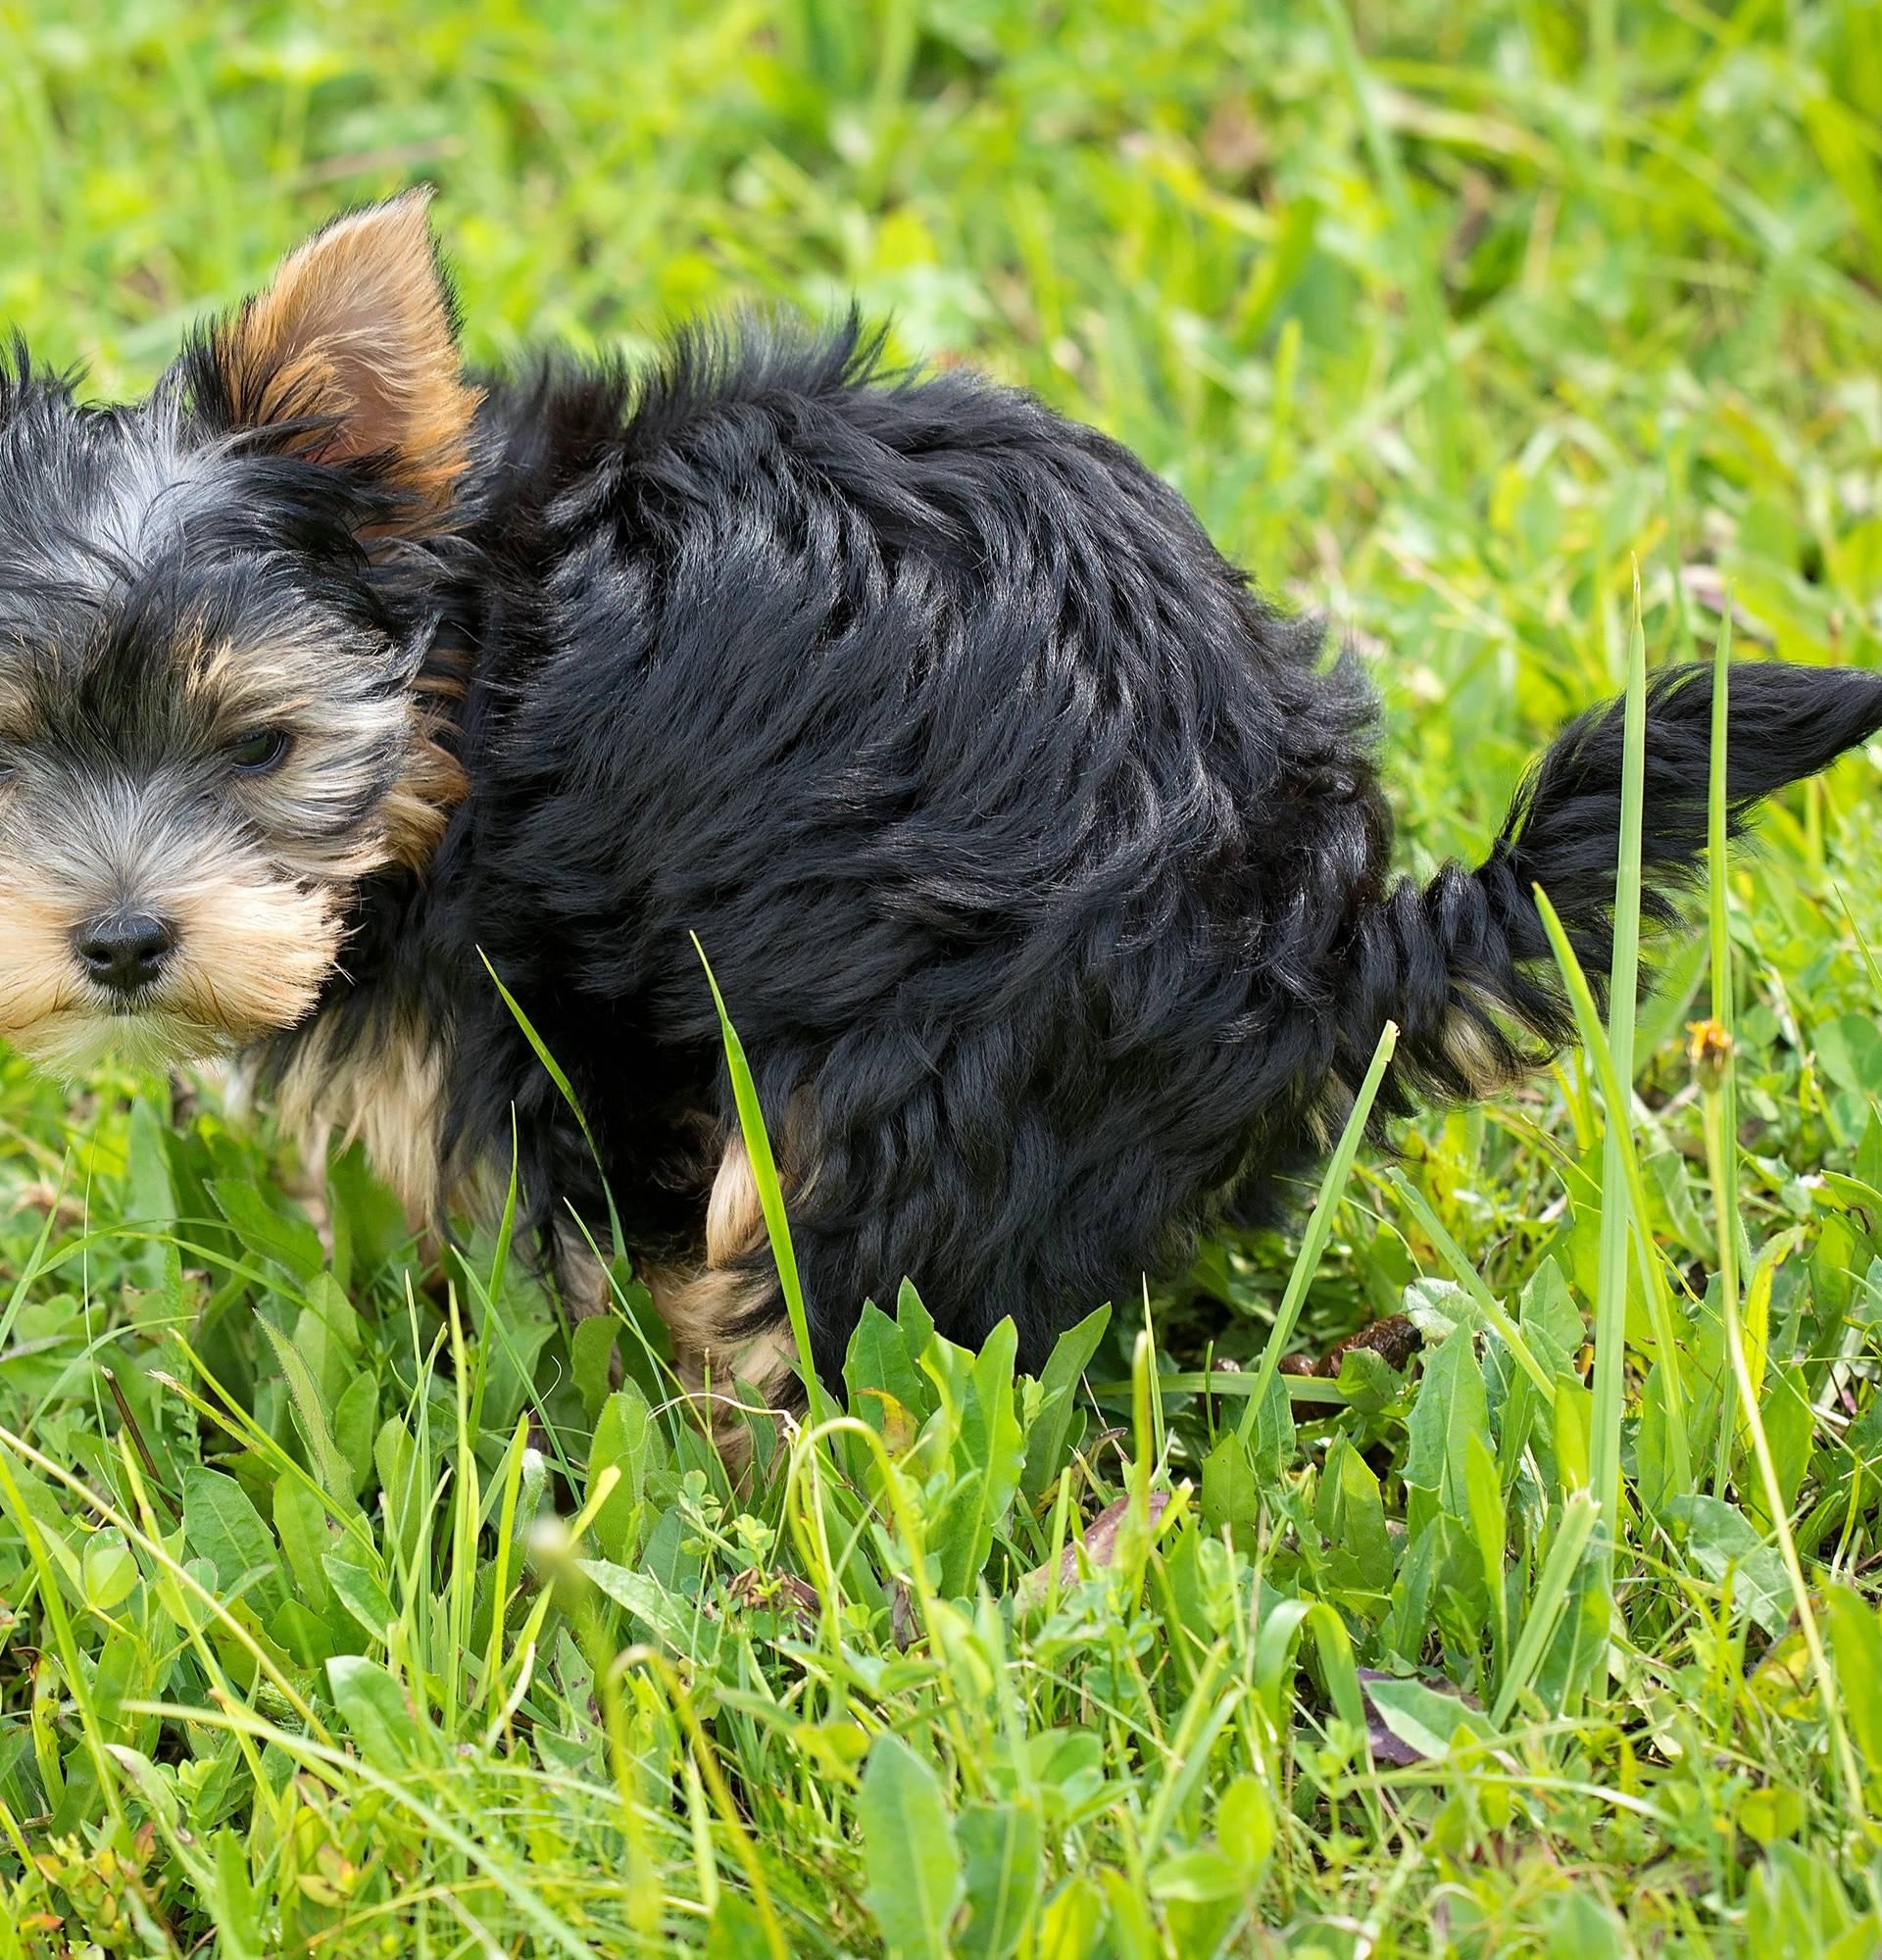 Opasnosti psećeg izmeta: Truje biljke, prenosi ljudske bolesti...